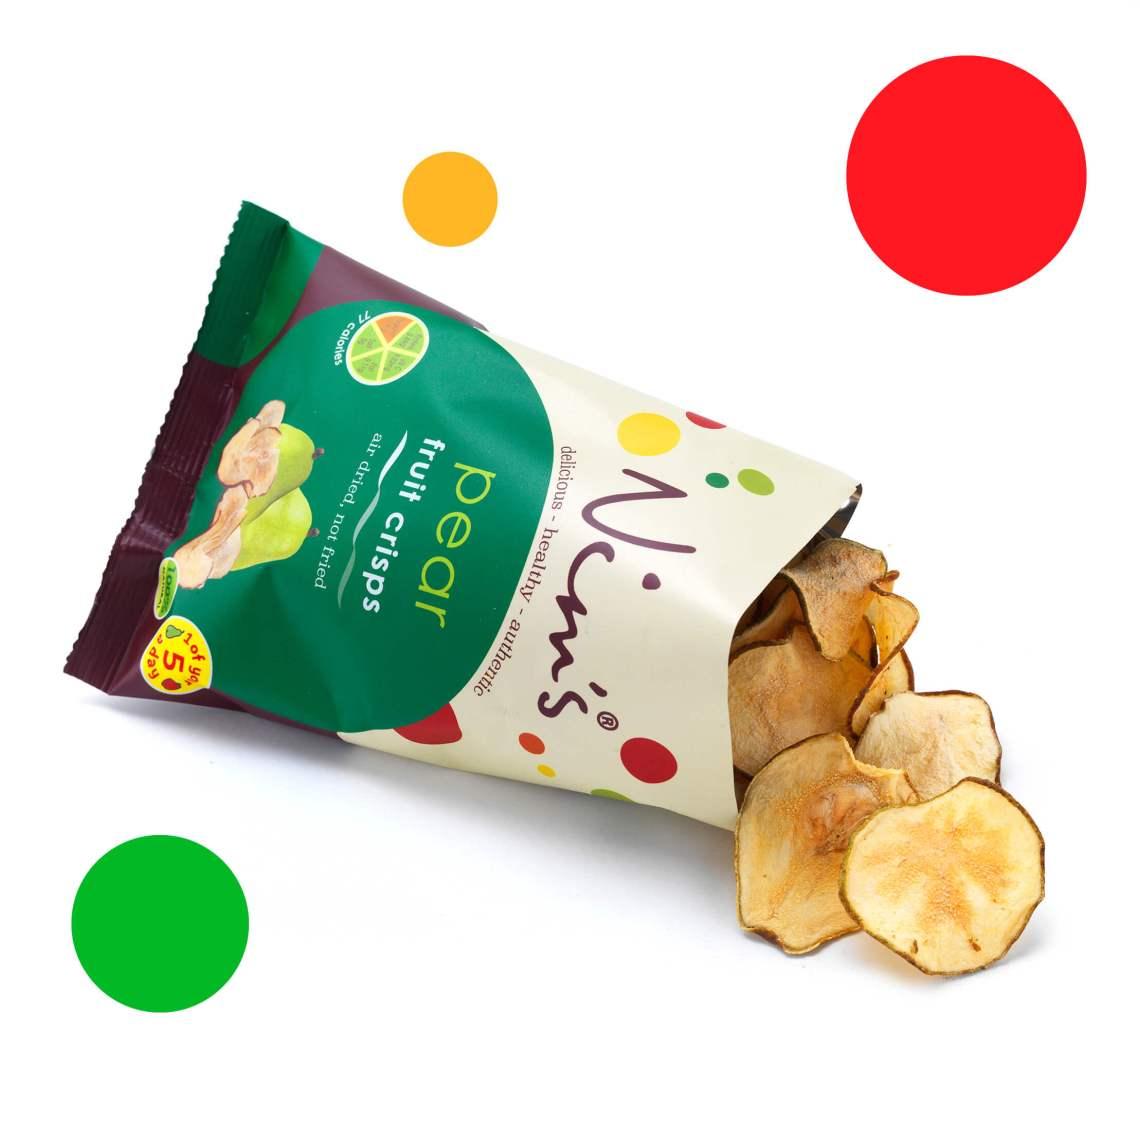 Nims Fruit Crisps - Pear Fruit Crisps